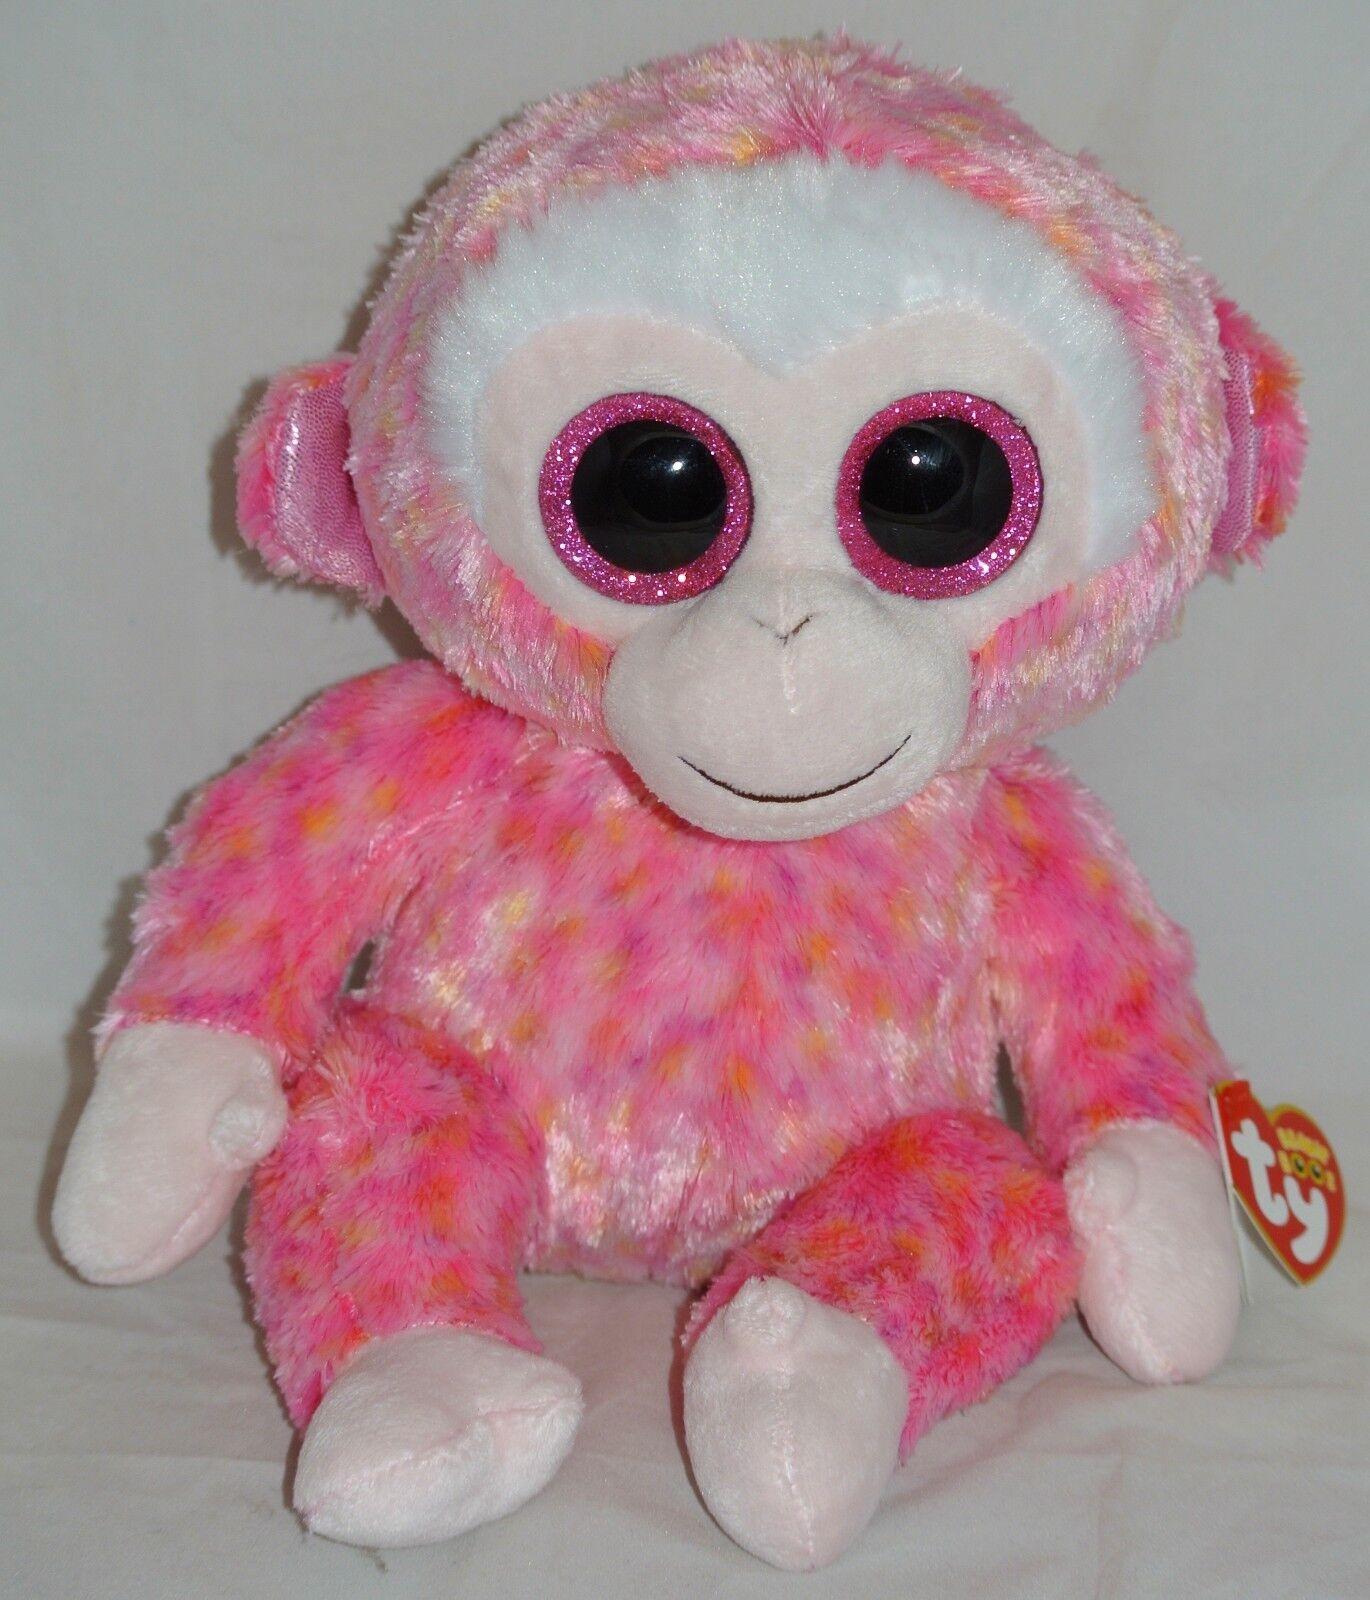 50178608a2b Ruby Red Monkey Beanie Boo Medium 13 Stuffed Animal by Ty 37010 for ...